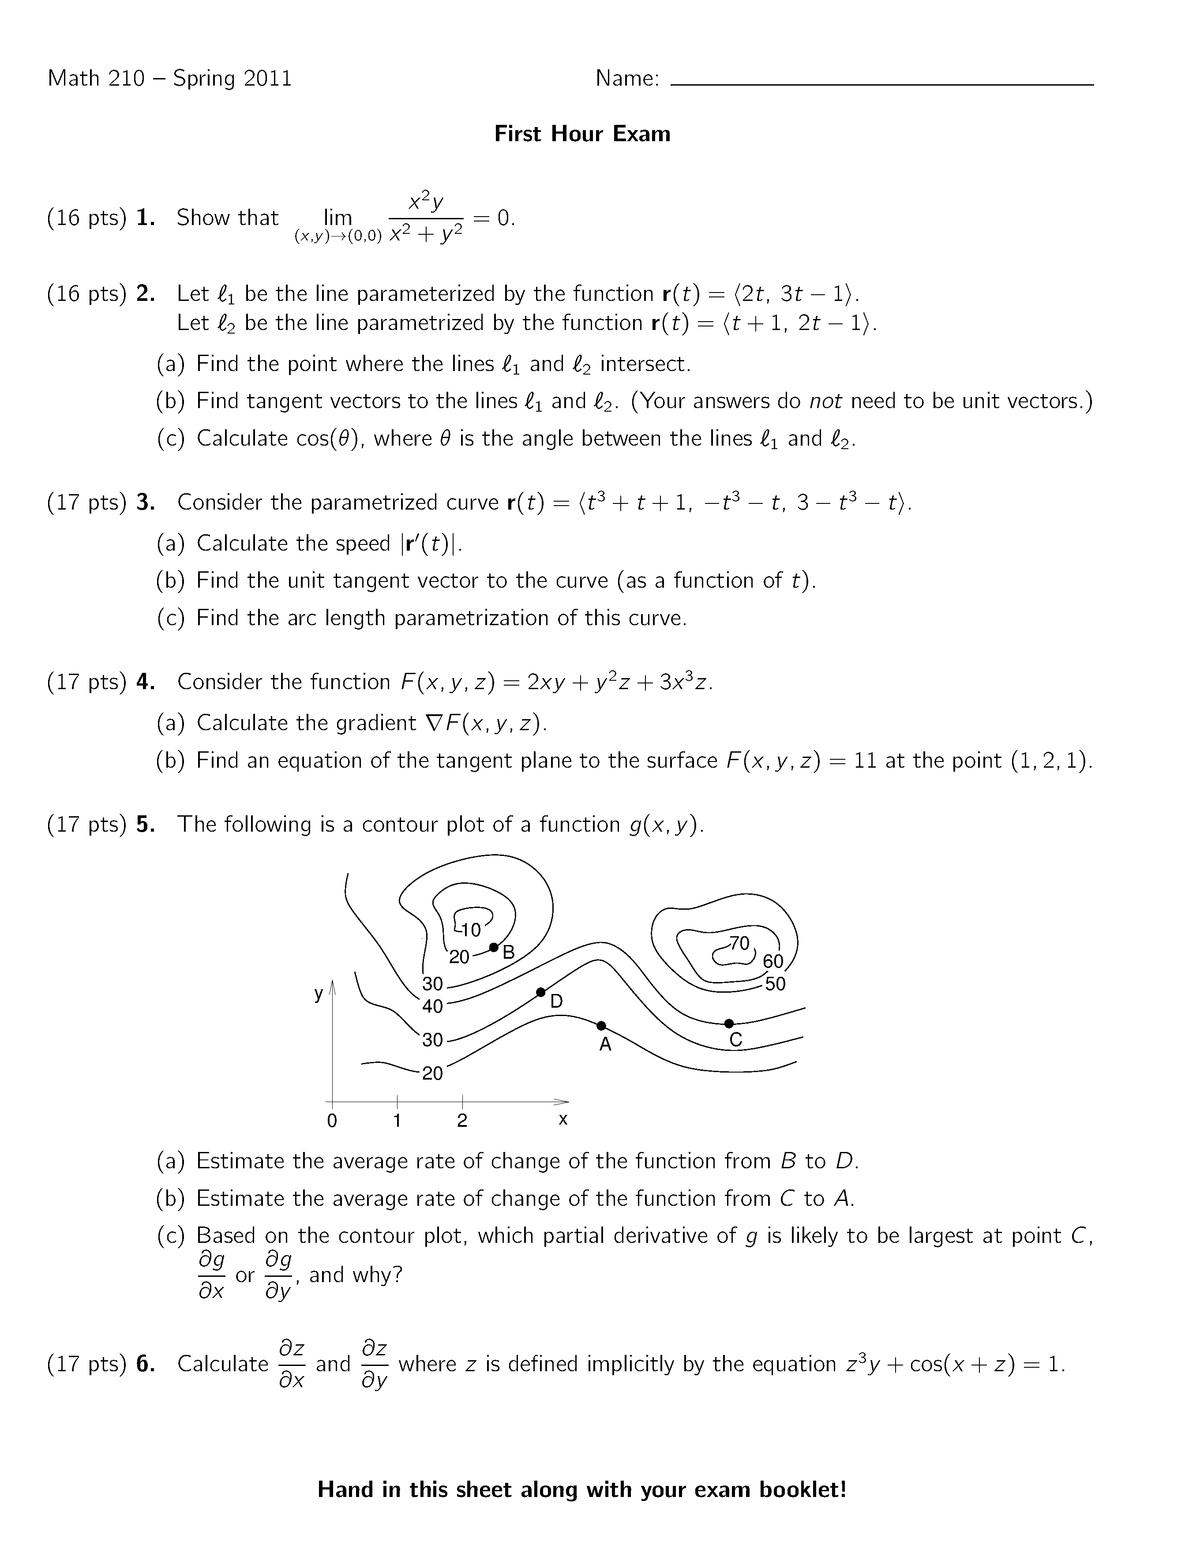 Exam Spring 2011, questions - MATH 210 Calculus Iii - UIC